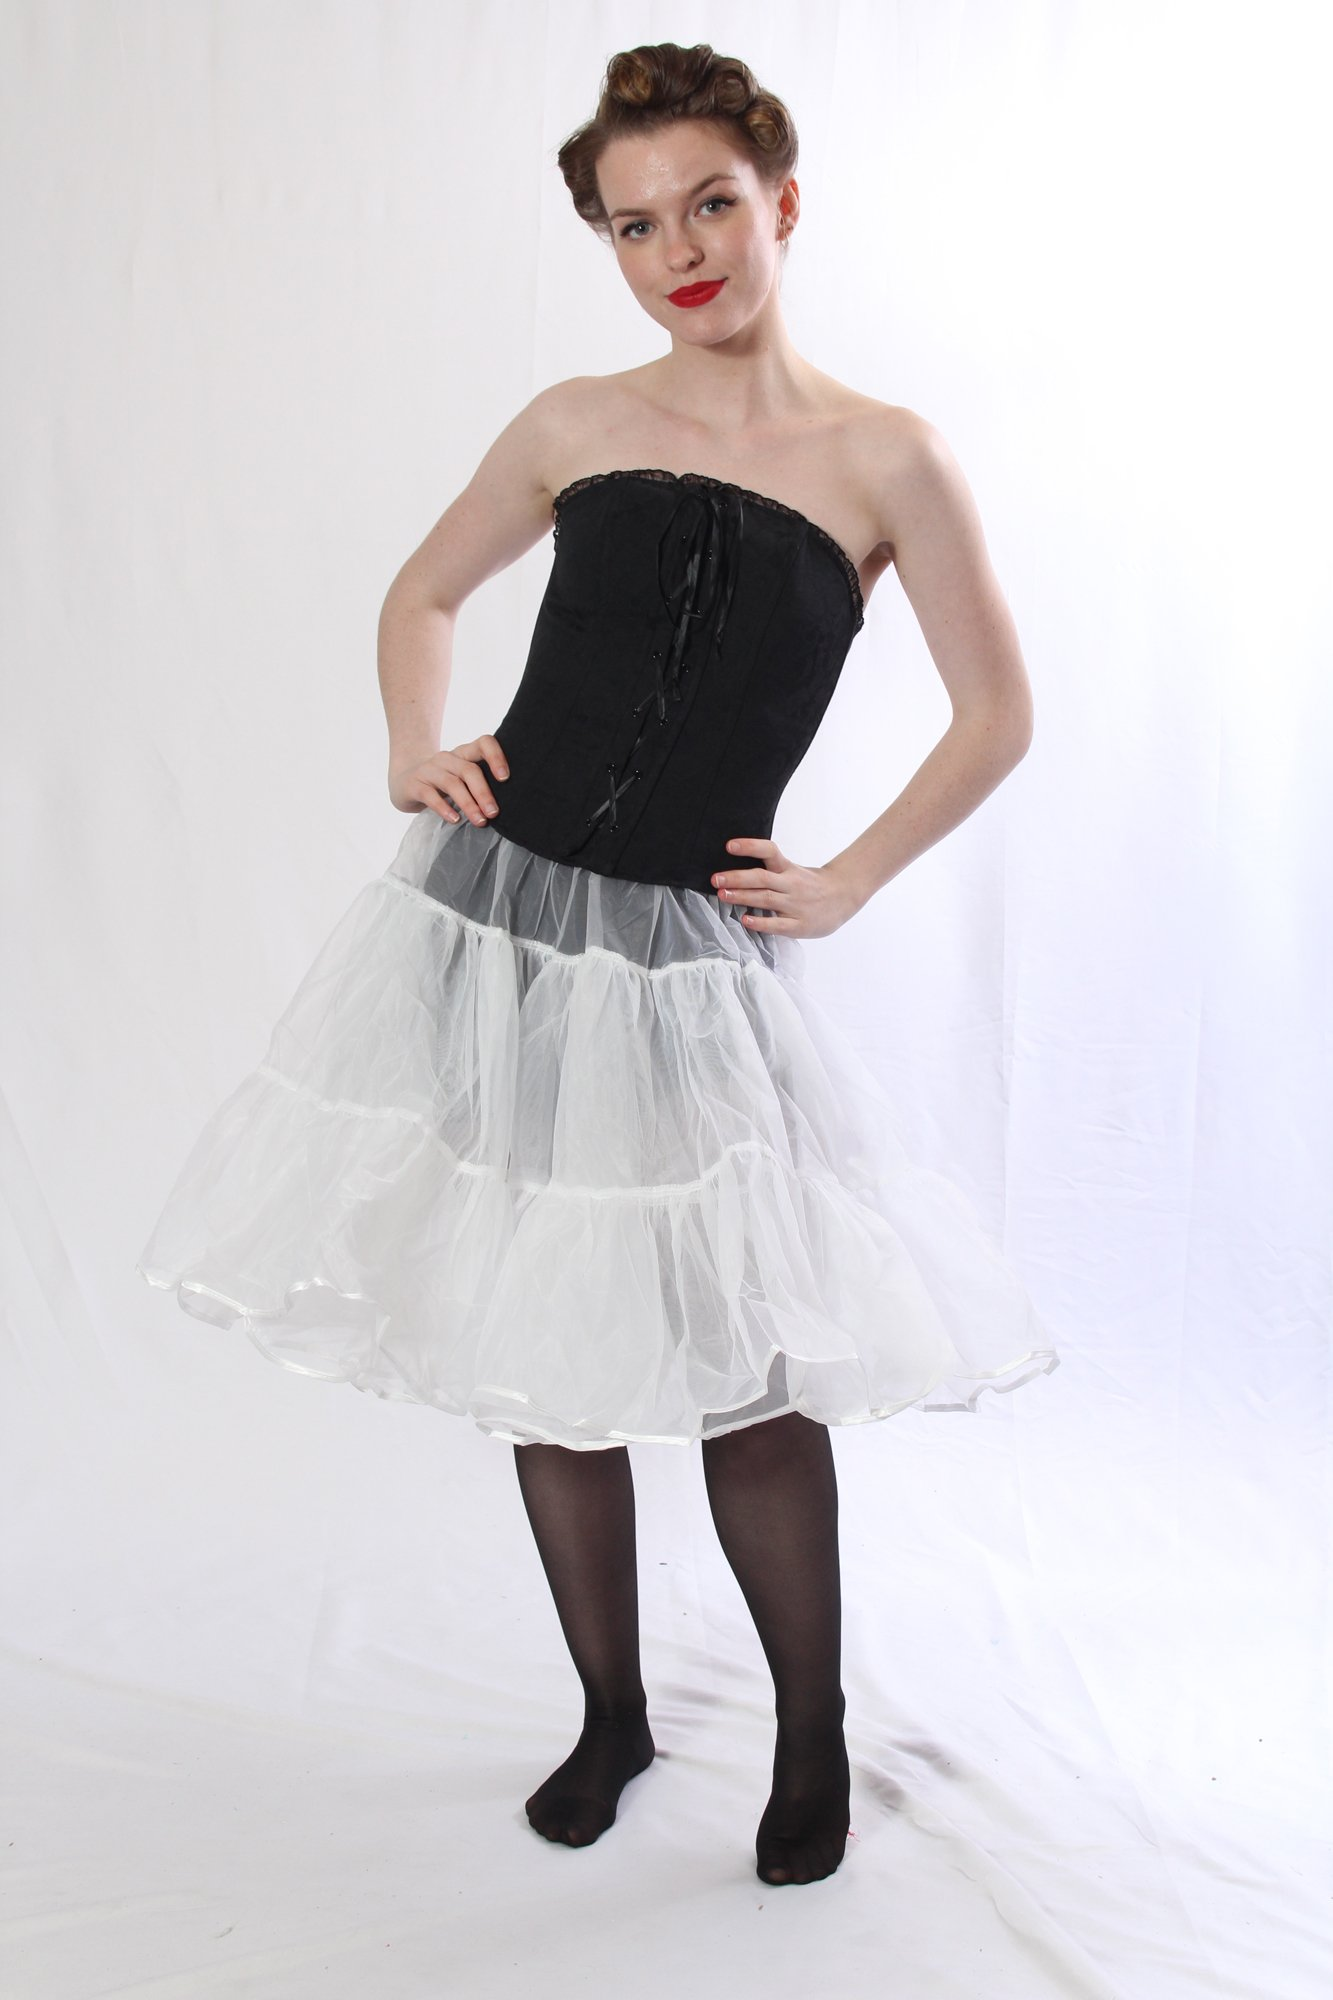 Petticoat Crinoline. Perfect Petticoat Skirt for Vintage Dresses, Petticoat Dresses, Poodle Skirts as Rockabilly Adult Tutu Skirt. Tulle Fabric; 22' Length - White Petticoat by BellaSous (Image #2)